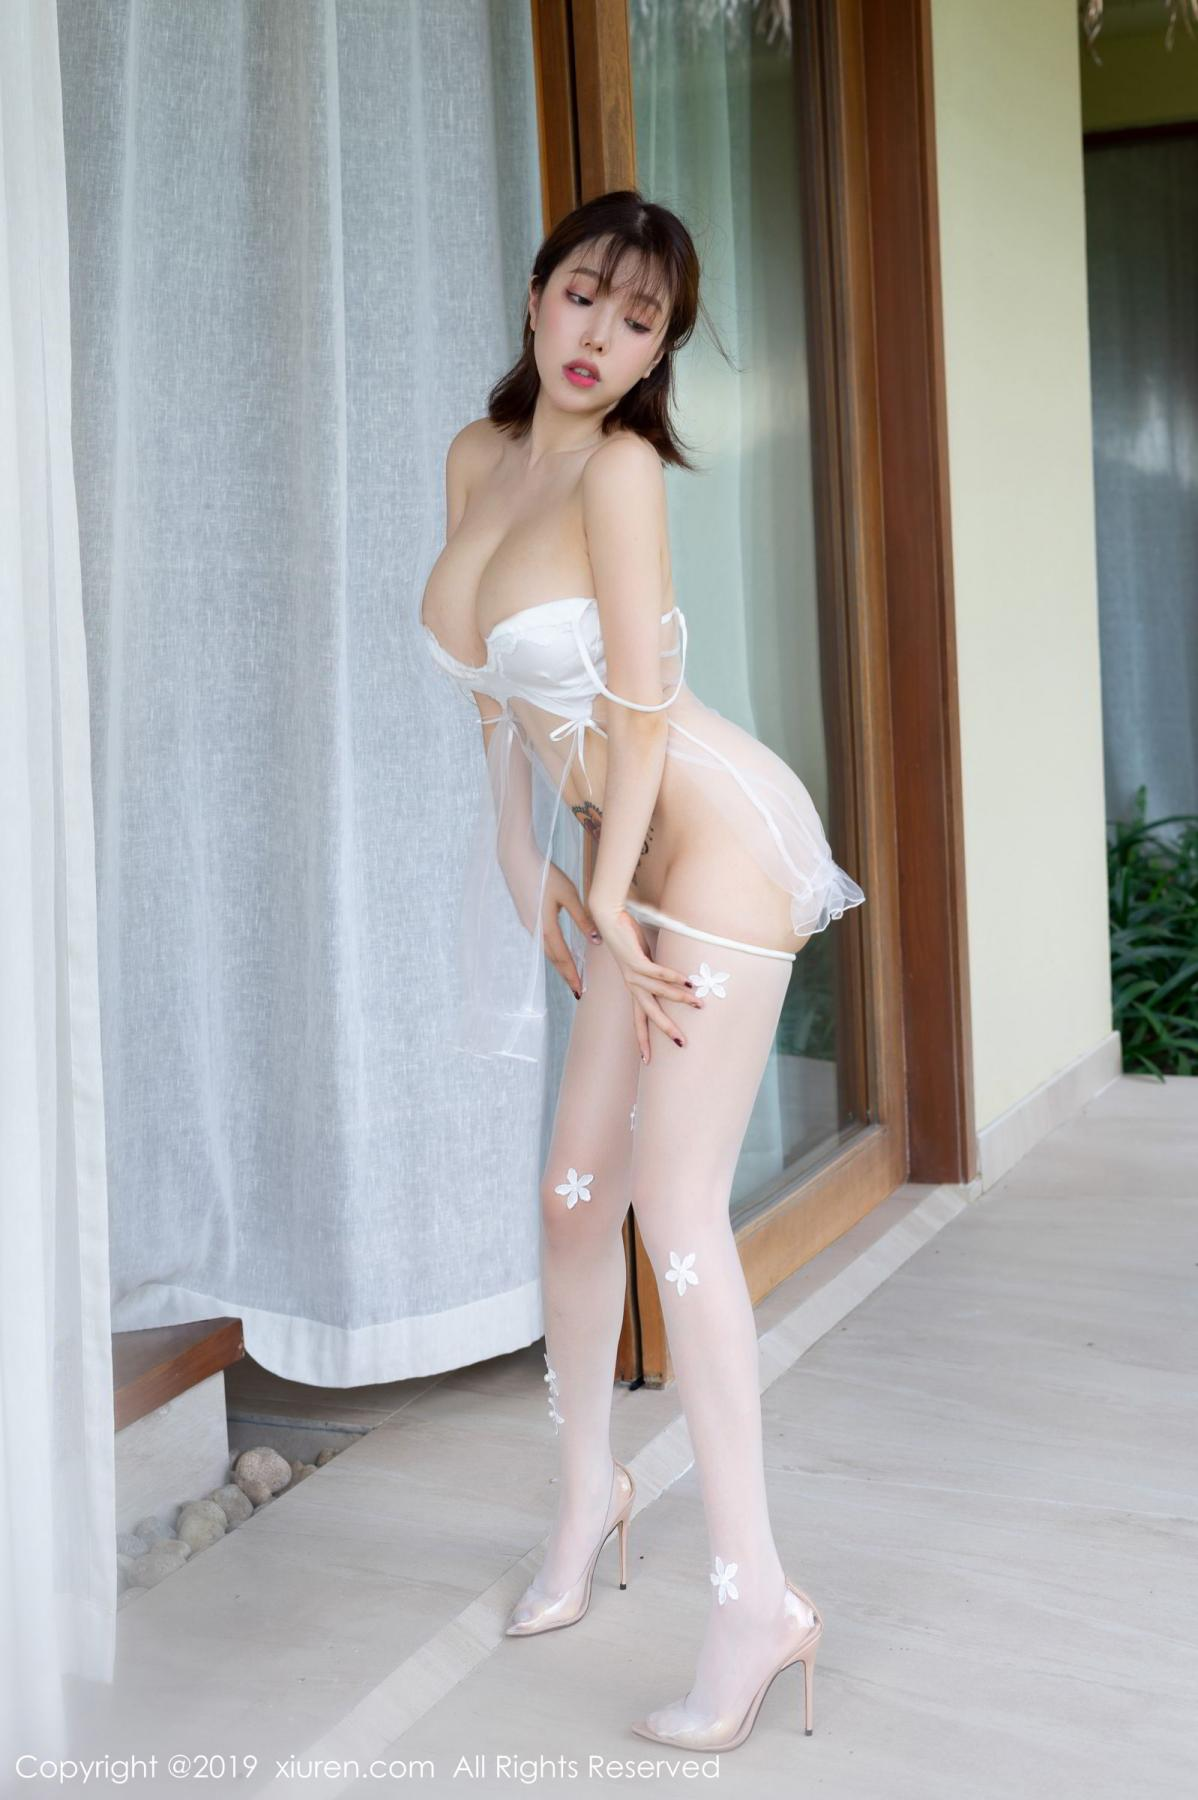 [XiuRen] Vol.1578 Huang Le Ran 44P, Huang Le Ran, Underwear, Xiuren